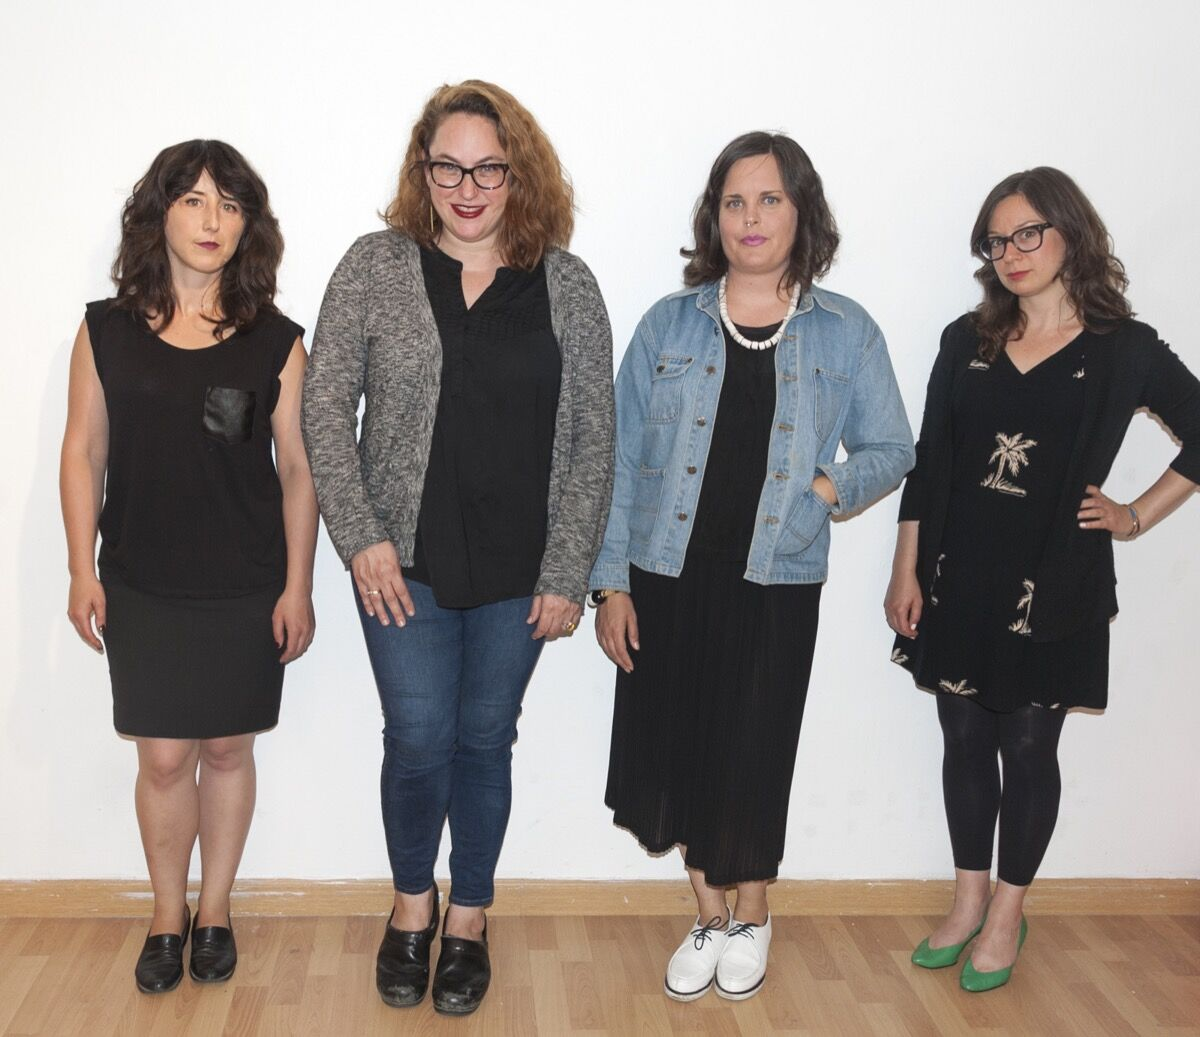 Sarah Thibault, Elizabeth Bernstein, Dana Hemenway, and Zoë Taleporos. Photo courtesy of Royal NoneSuch Gallery.